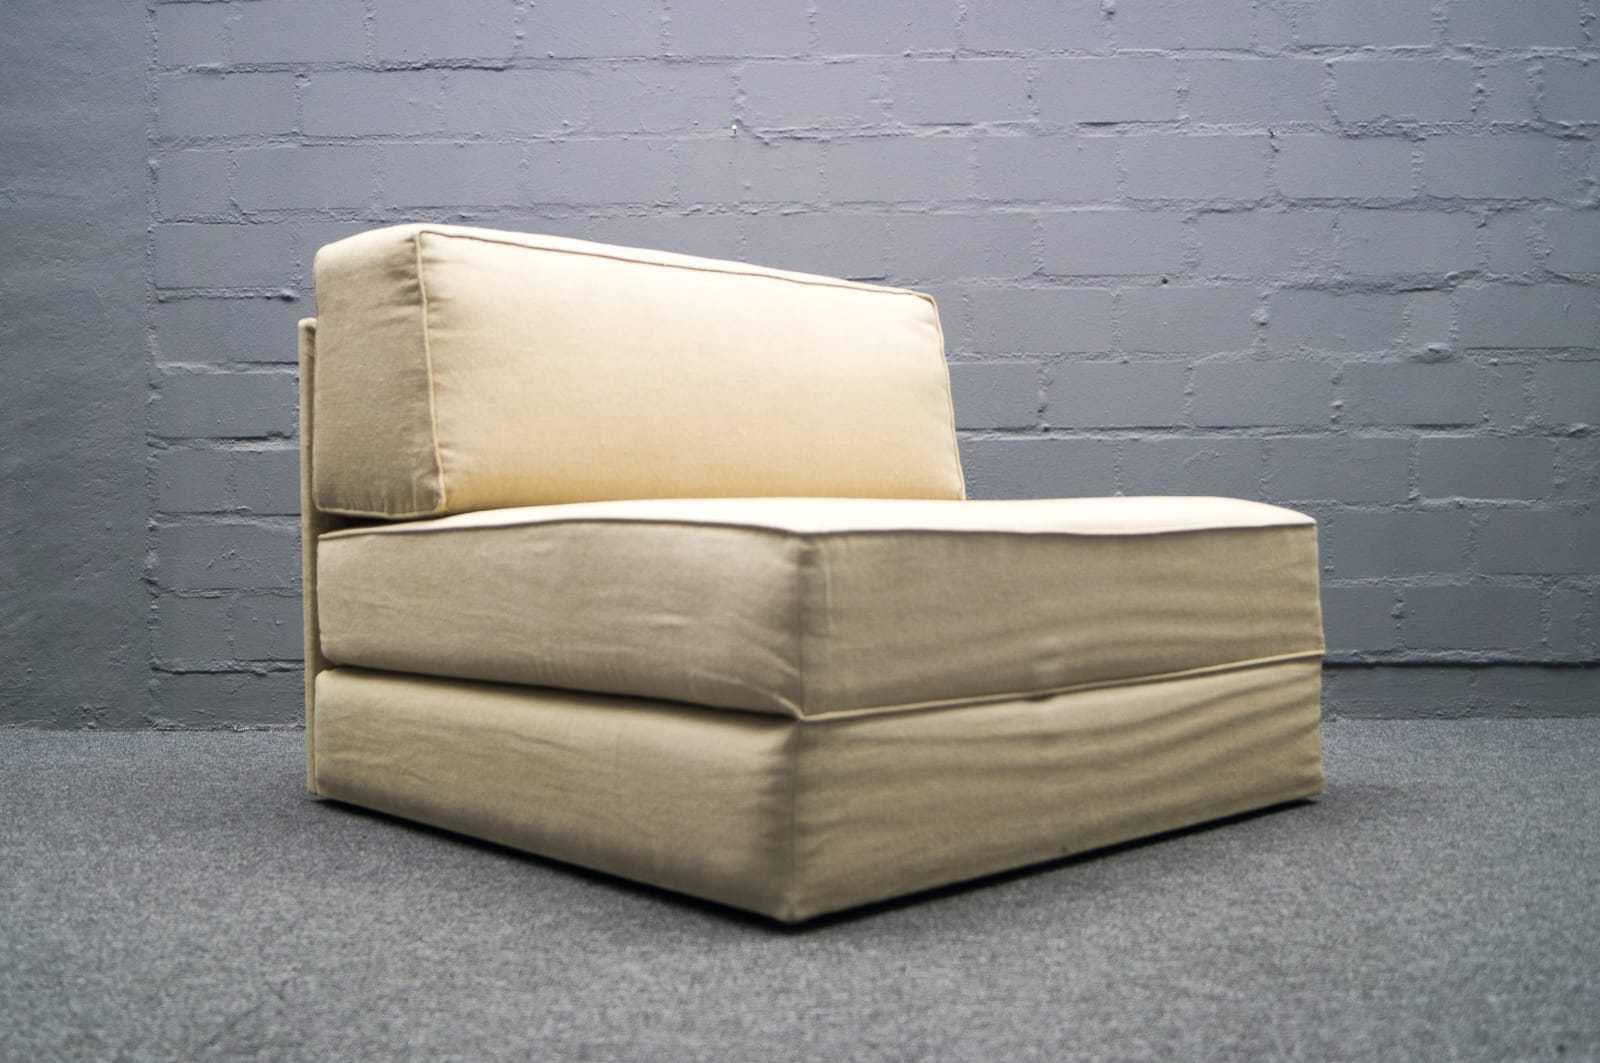 wohnform sessel daybed ausklappbar lounge chair 60er 70er g stebett bett 1v 2. Black Bedroom Furniture Sets. Home Design Ideas